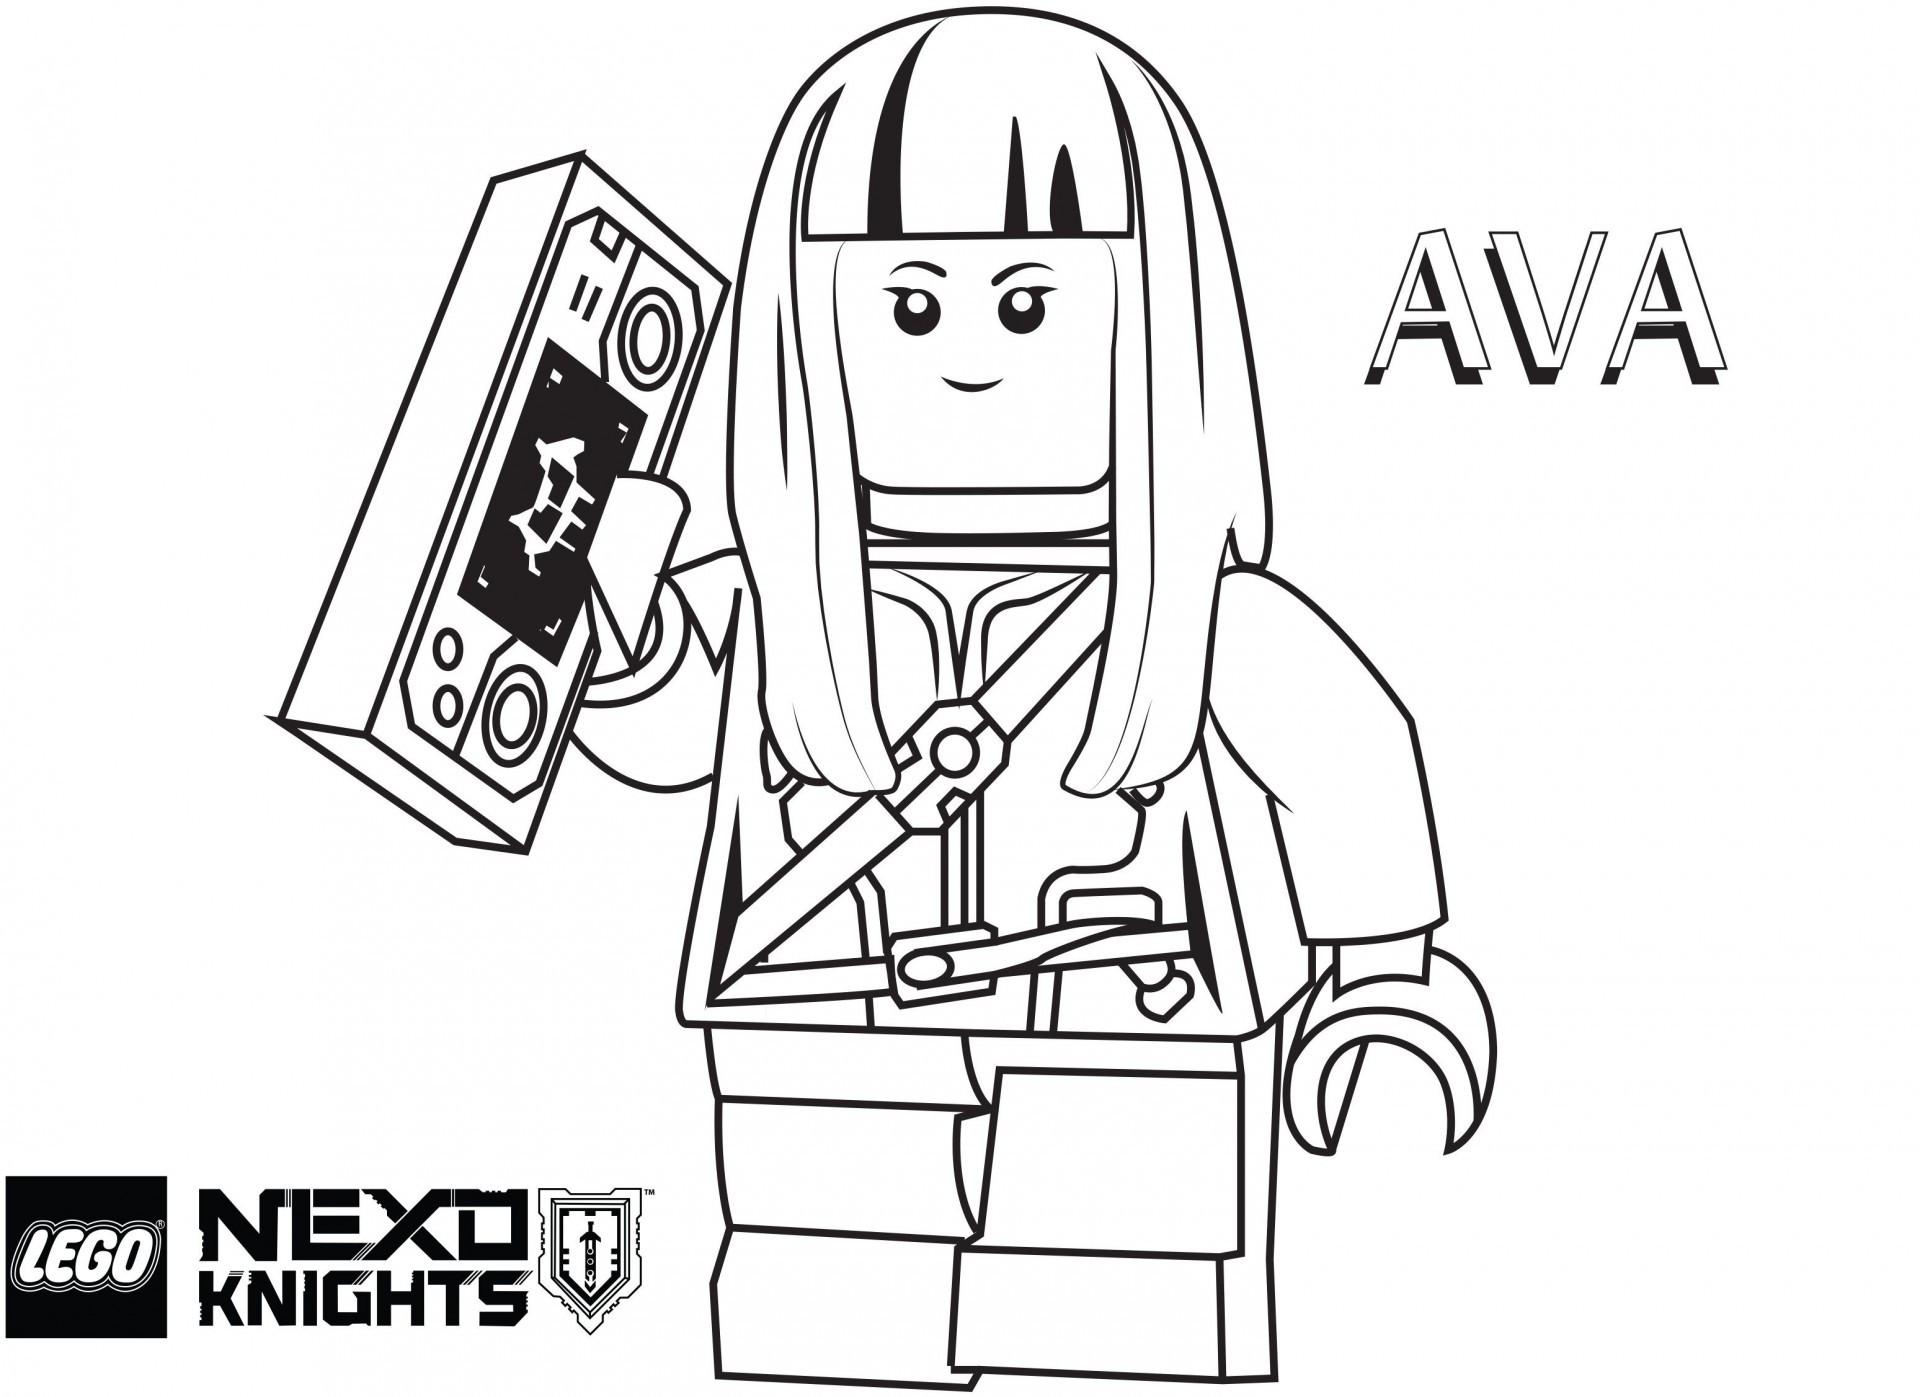 Ausmalbild Nexo Knights Einzigartig 001 Malbuch 2256x1276 Pony 01 744w 2xl R Lego Malvorlagen Das Bild